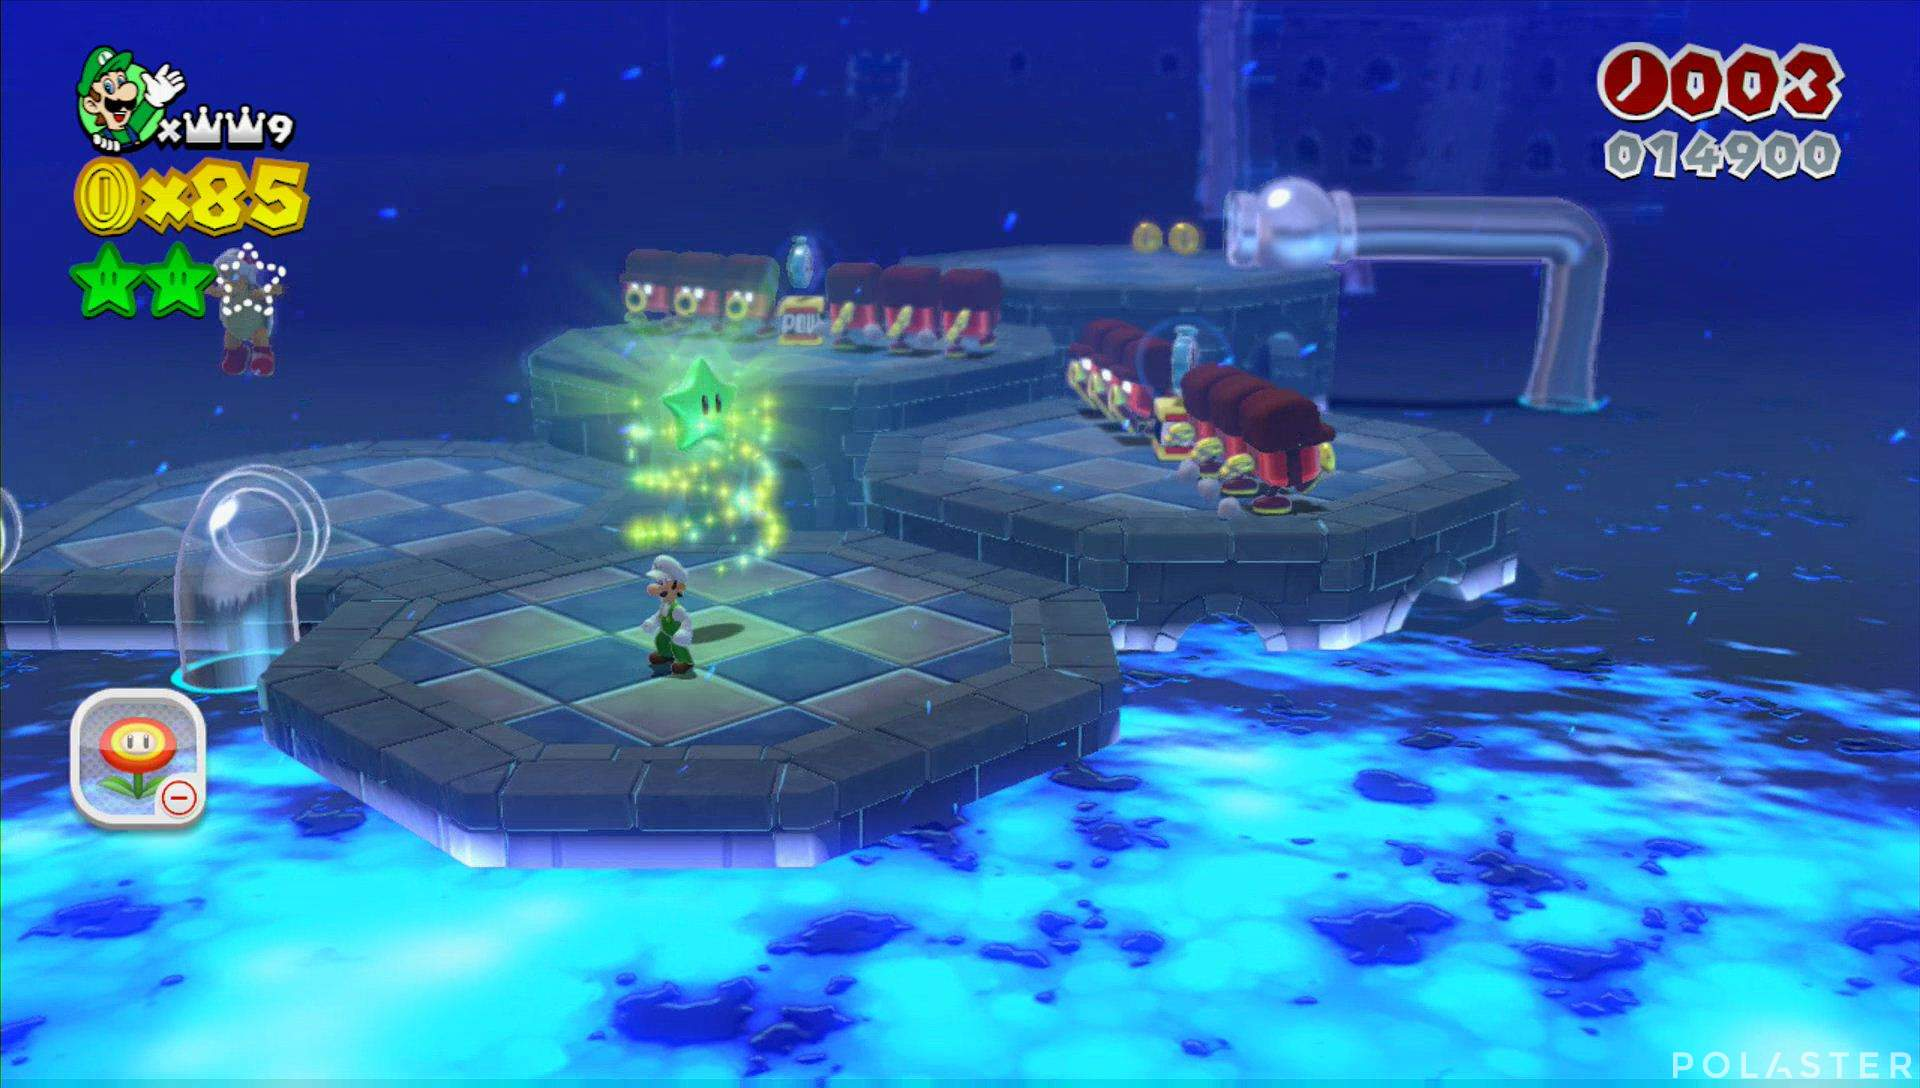 Super Mario 3D World Mundo Flor-4 Estrella 3